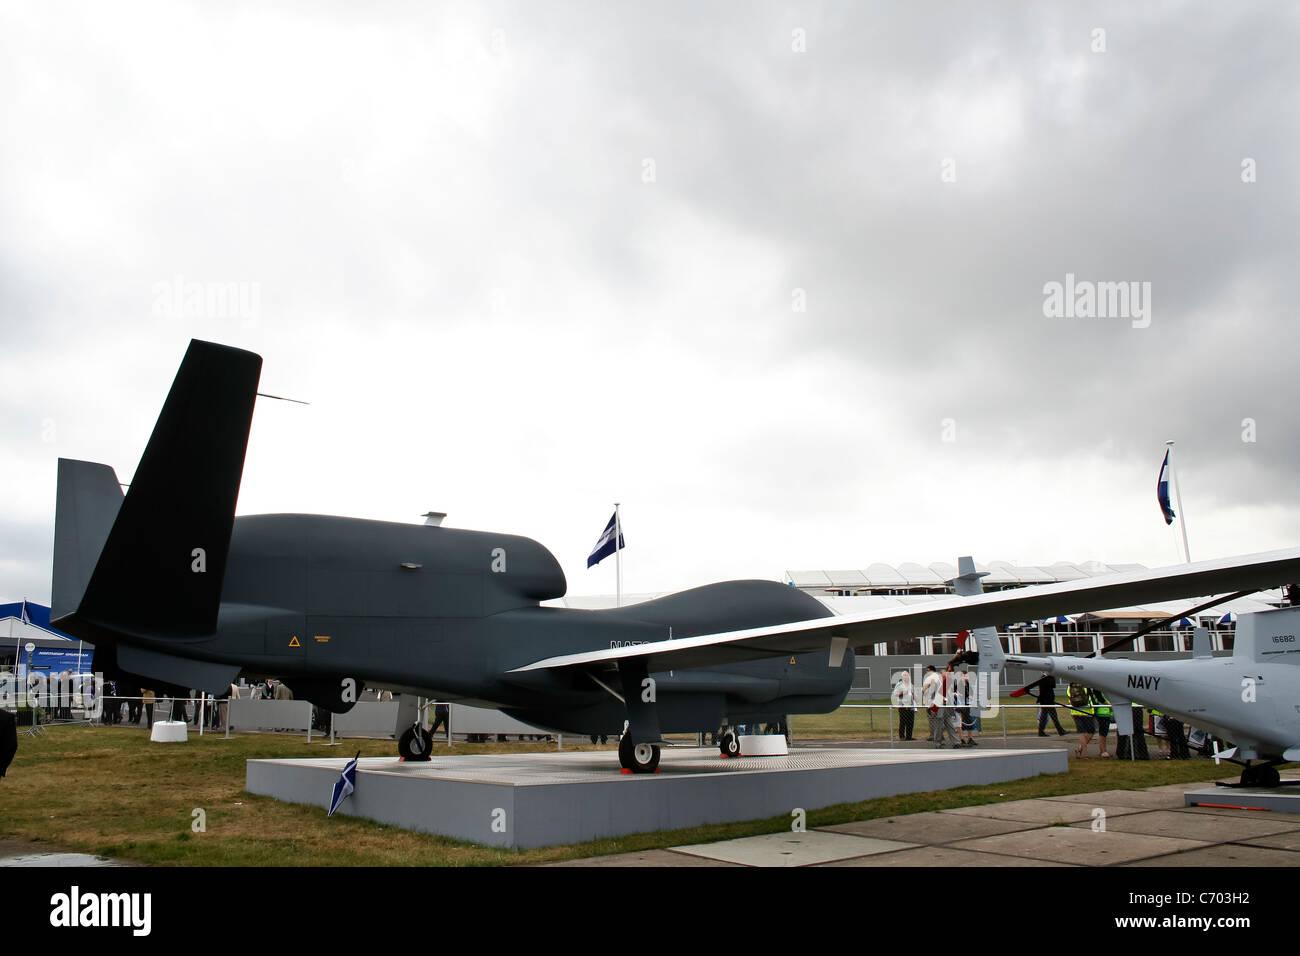 Northrop Grumman RQ-4 Global Hawk UAV (unmanned aerial vehicle) at the Farnborough International Airshow - Stock Image